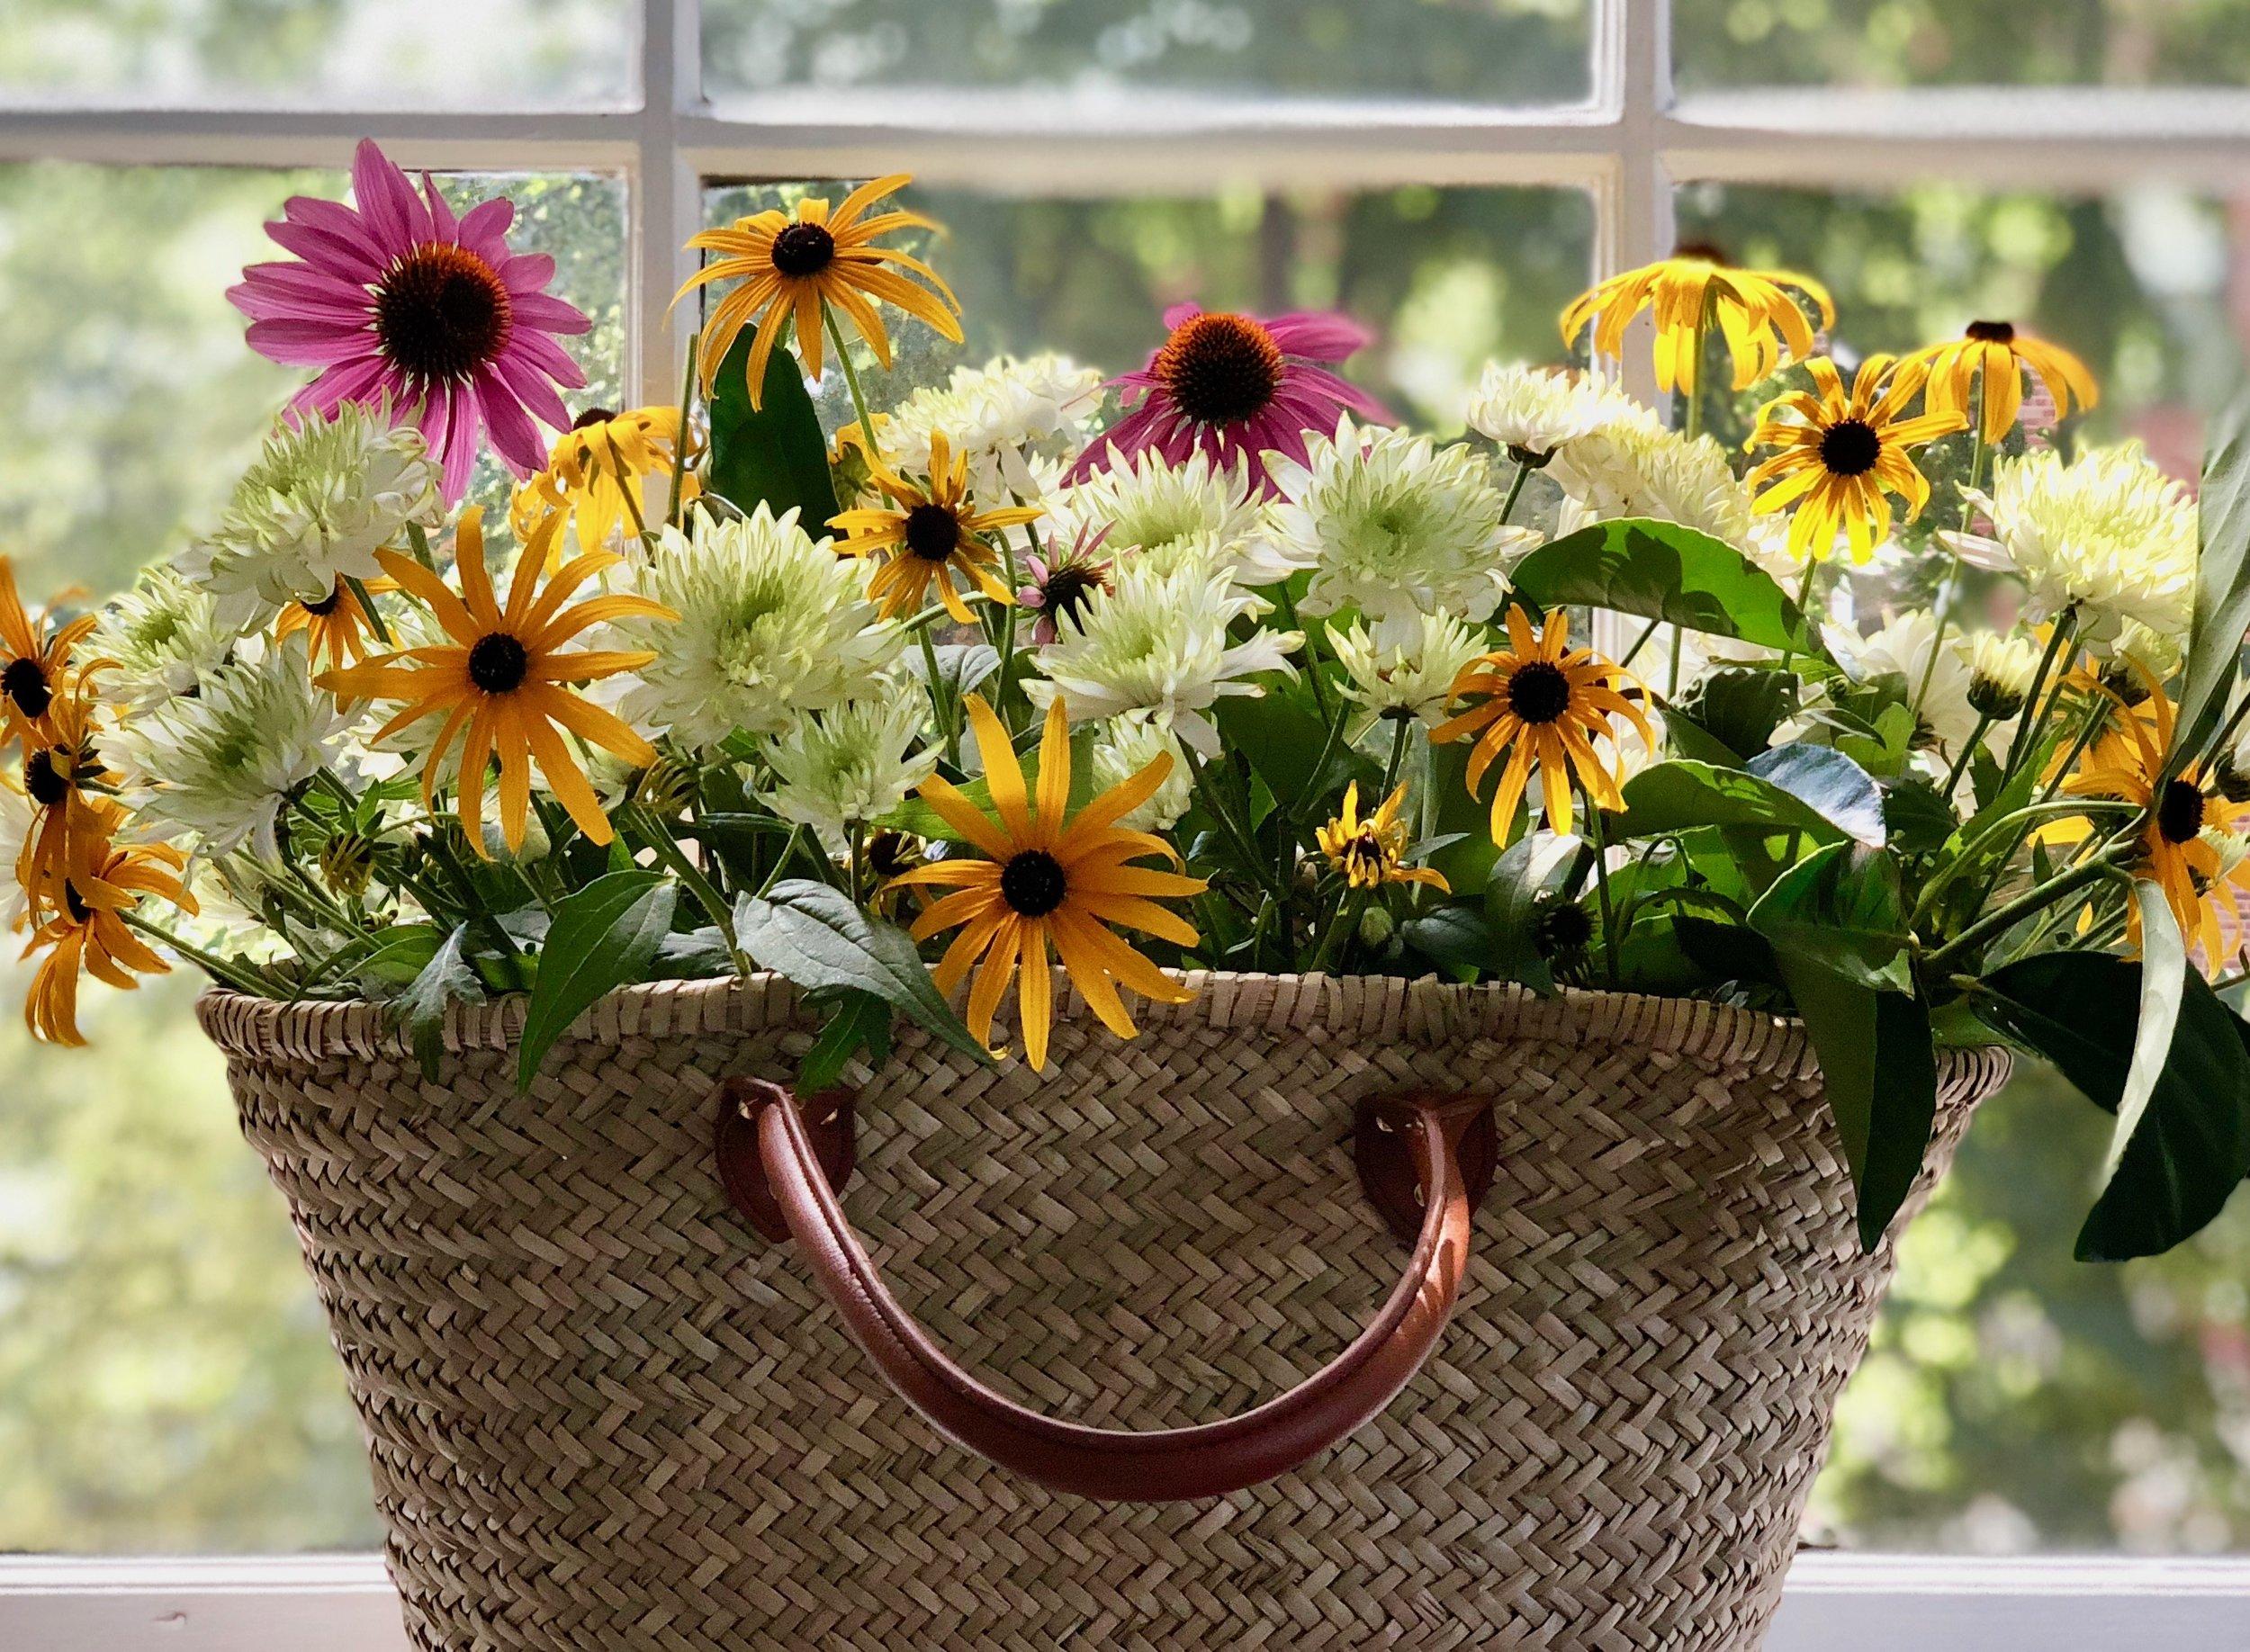 lucy-grymes-blog-effortless-entertainment-flowers.jpg